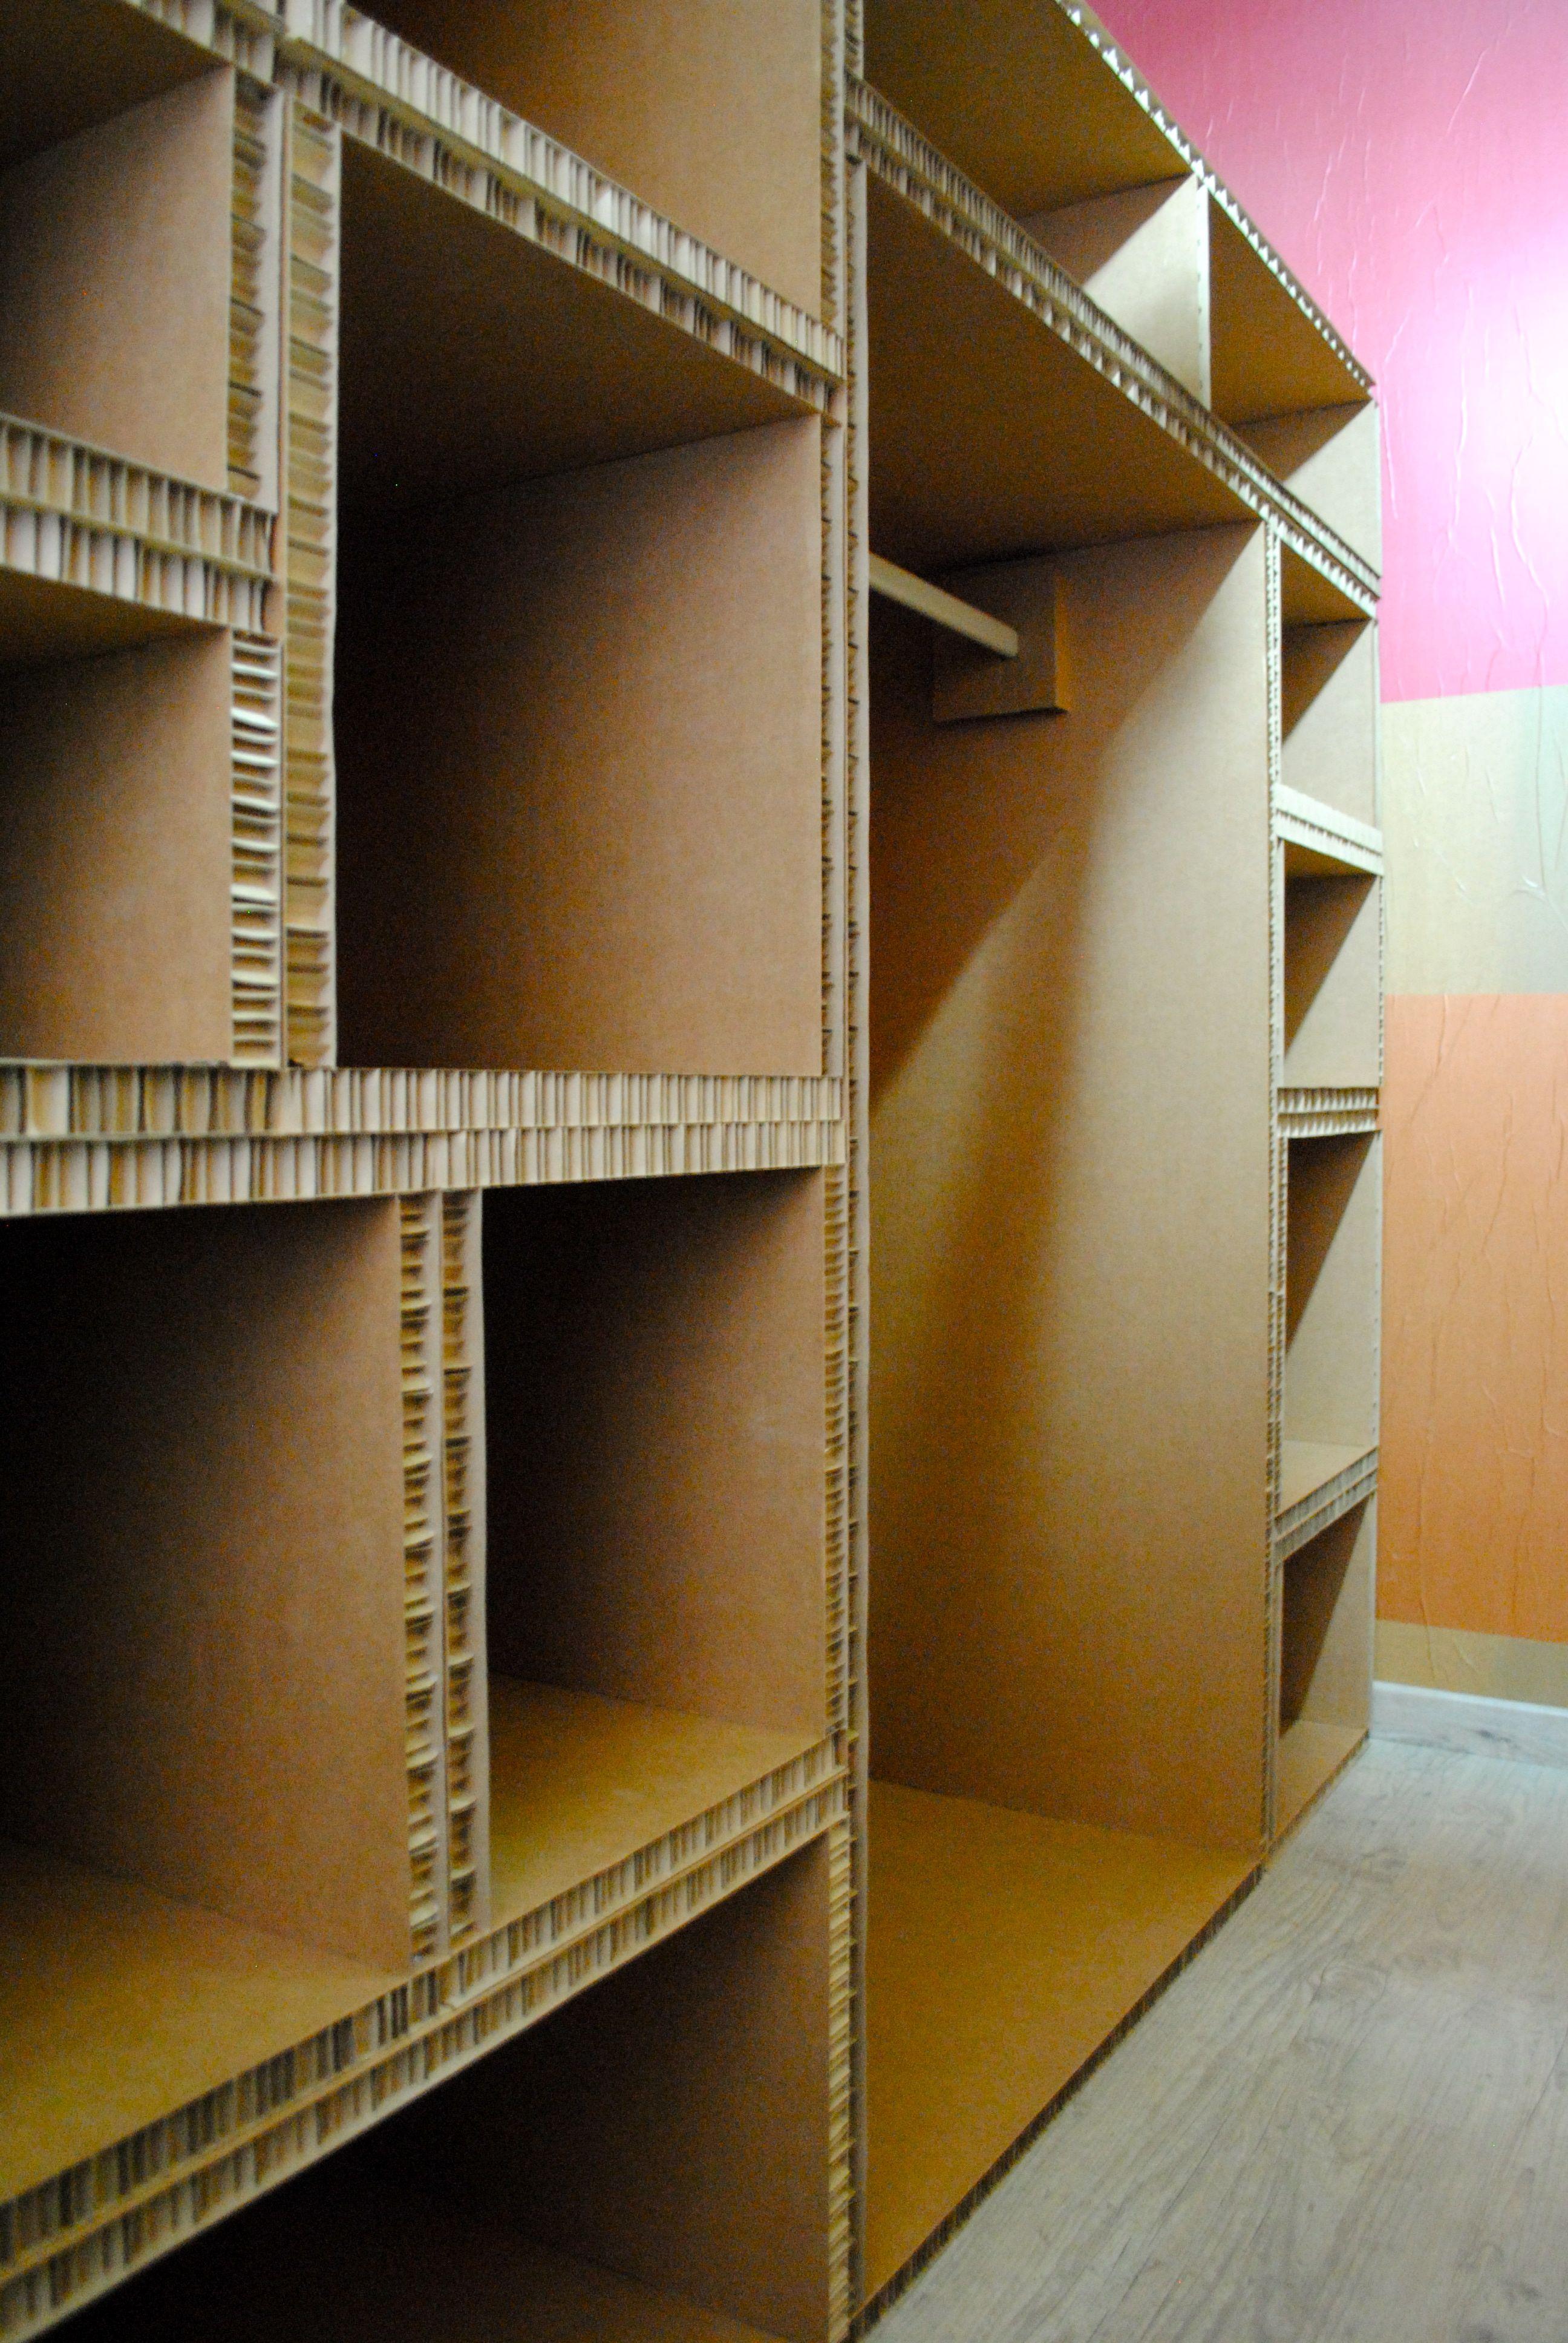 Dsc_0046 Carton Pinterest Cardboard Furniture And Organizing # Muebles Google Translate